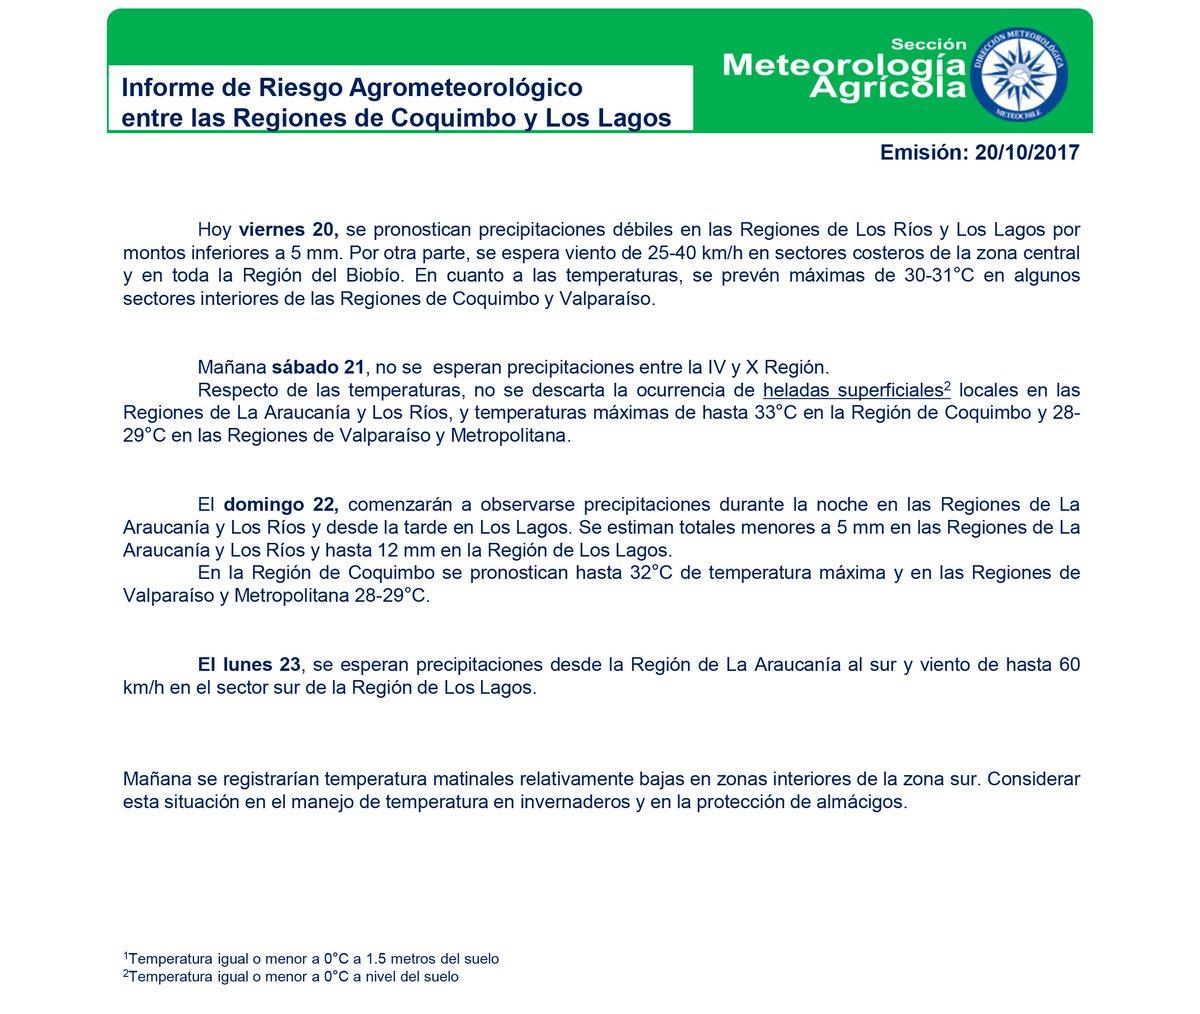 INFORME #Agrometeorológico desde Coquimbo a LosLagos #precipitaciones en la zonasur #temperaturas @MinagriCL @MundoAgropecuar @AgriculturaFM  https://t.co/uJsHJOhQve